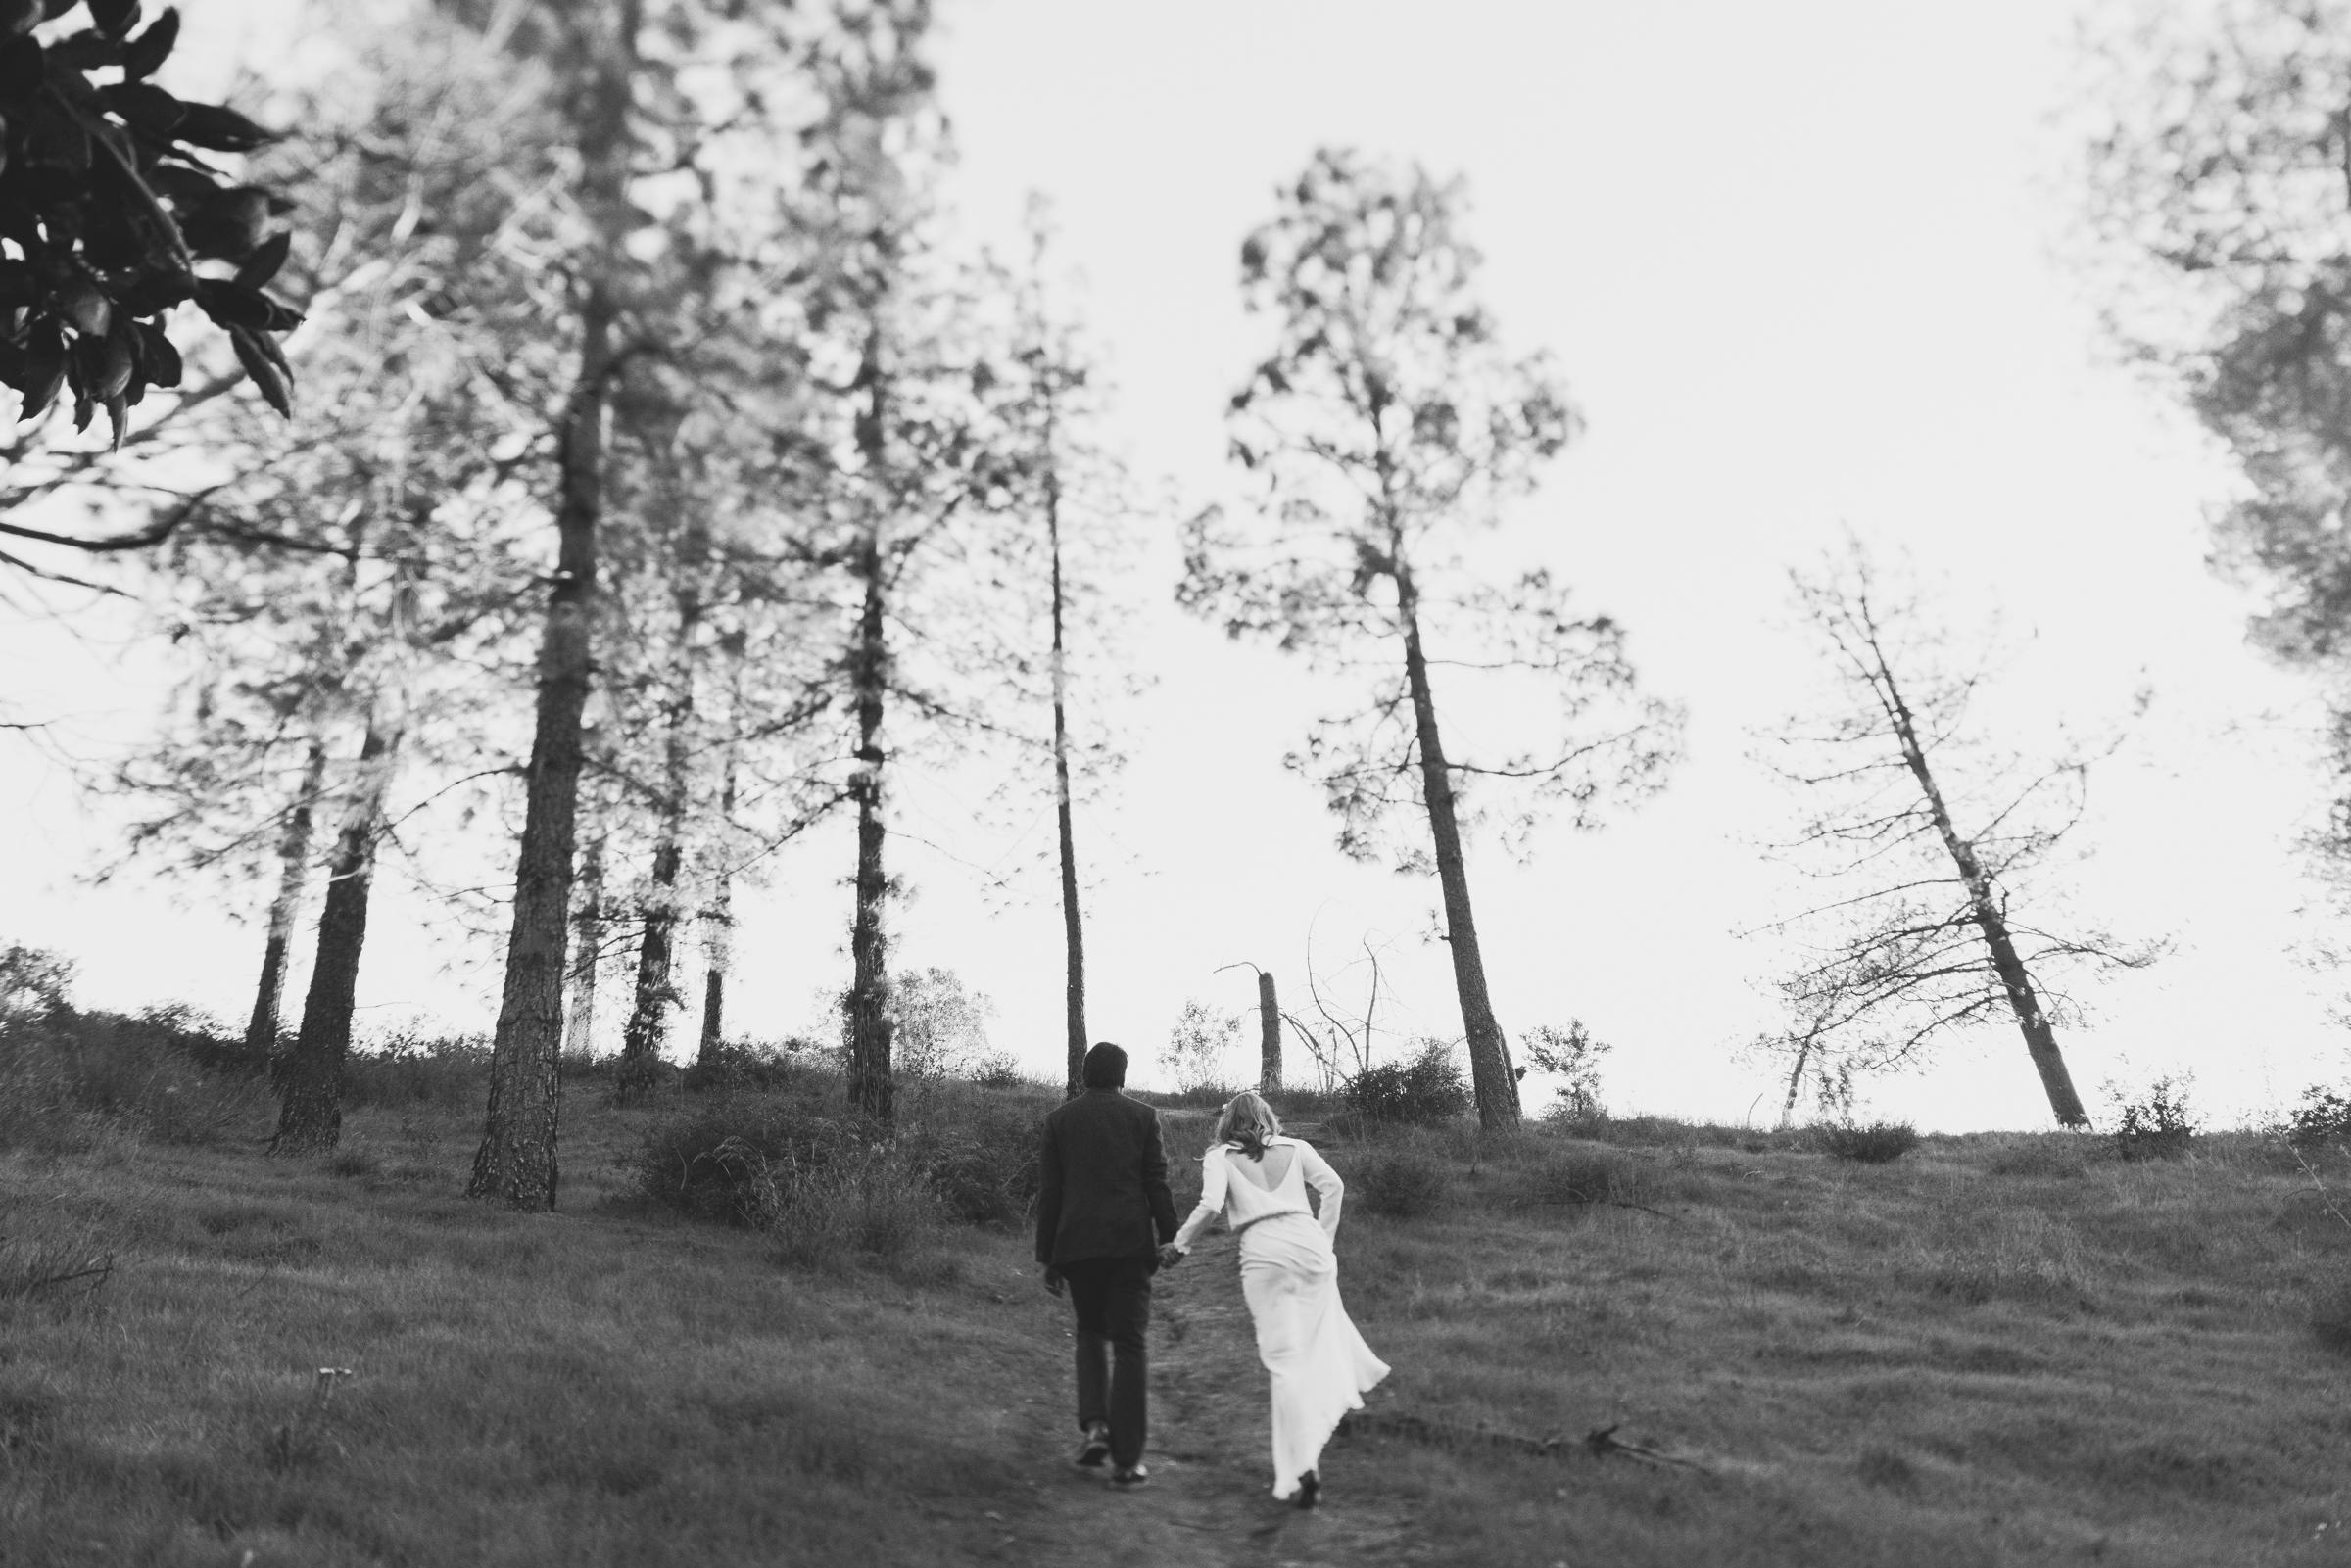 ©Isaiah + Taylor Photography - Intimate Elopement, Eaton Canyon, Los Angeles Wedding Photographer-60.jpg